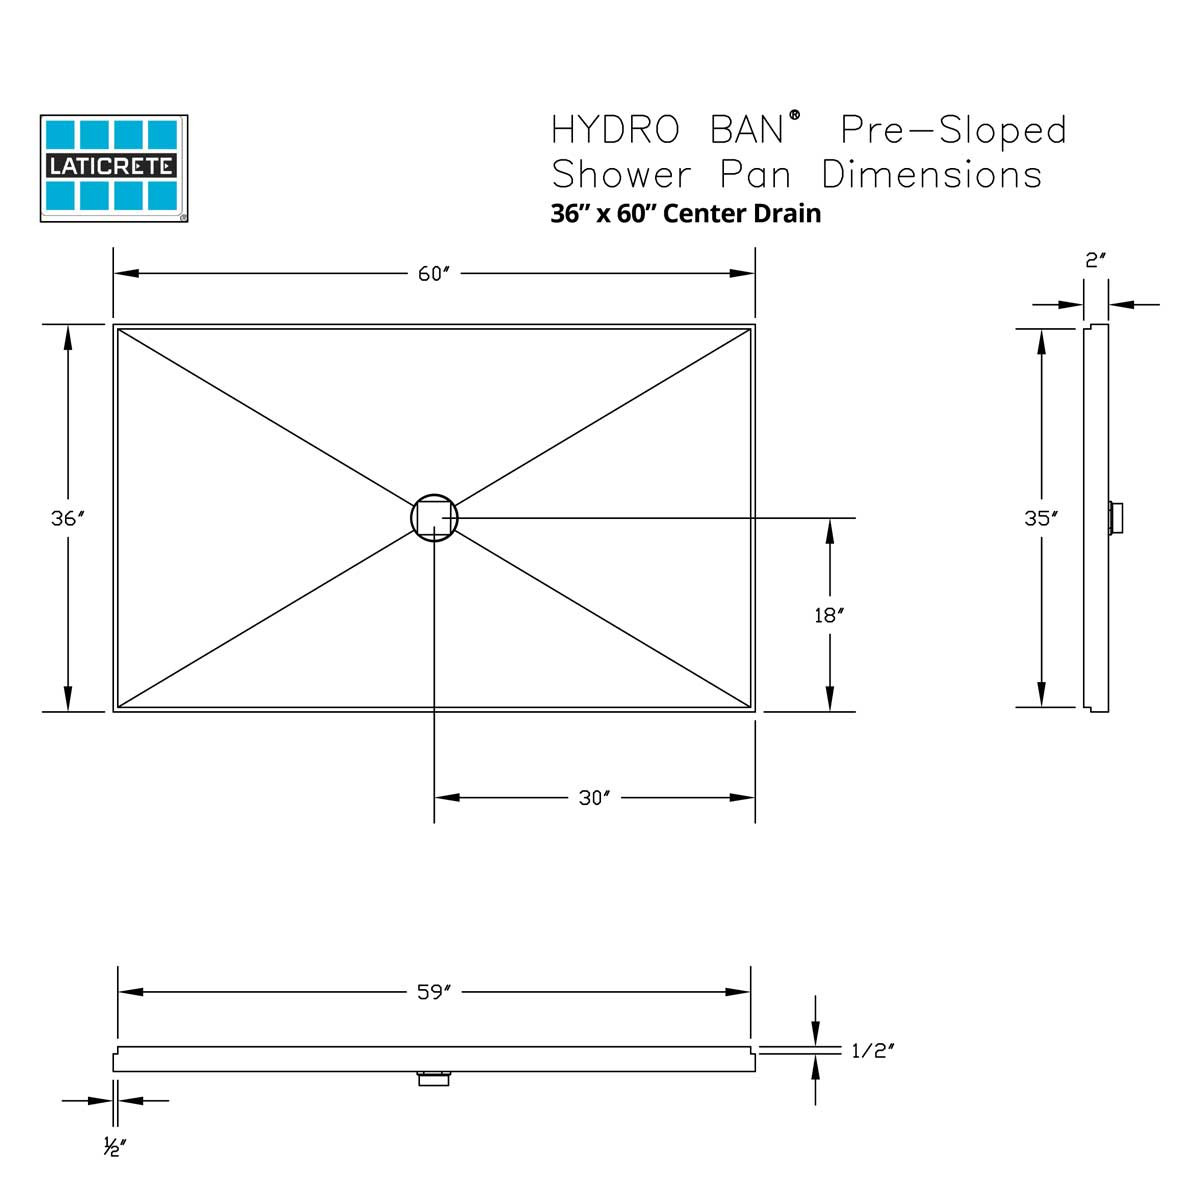 9350-3660-PVC 36 x 60in Center Drain Hydro Ban Pre-sloped Shower Pan